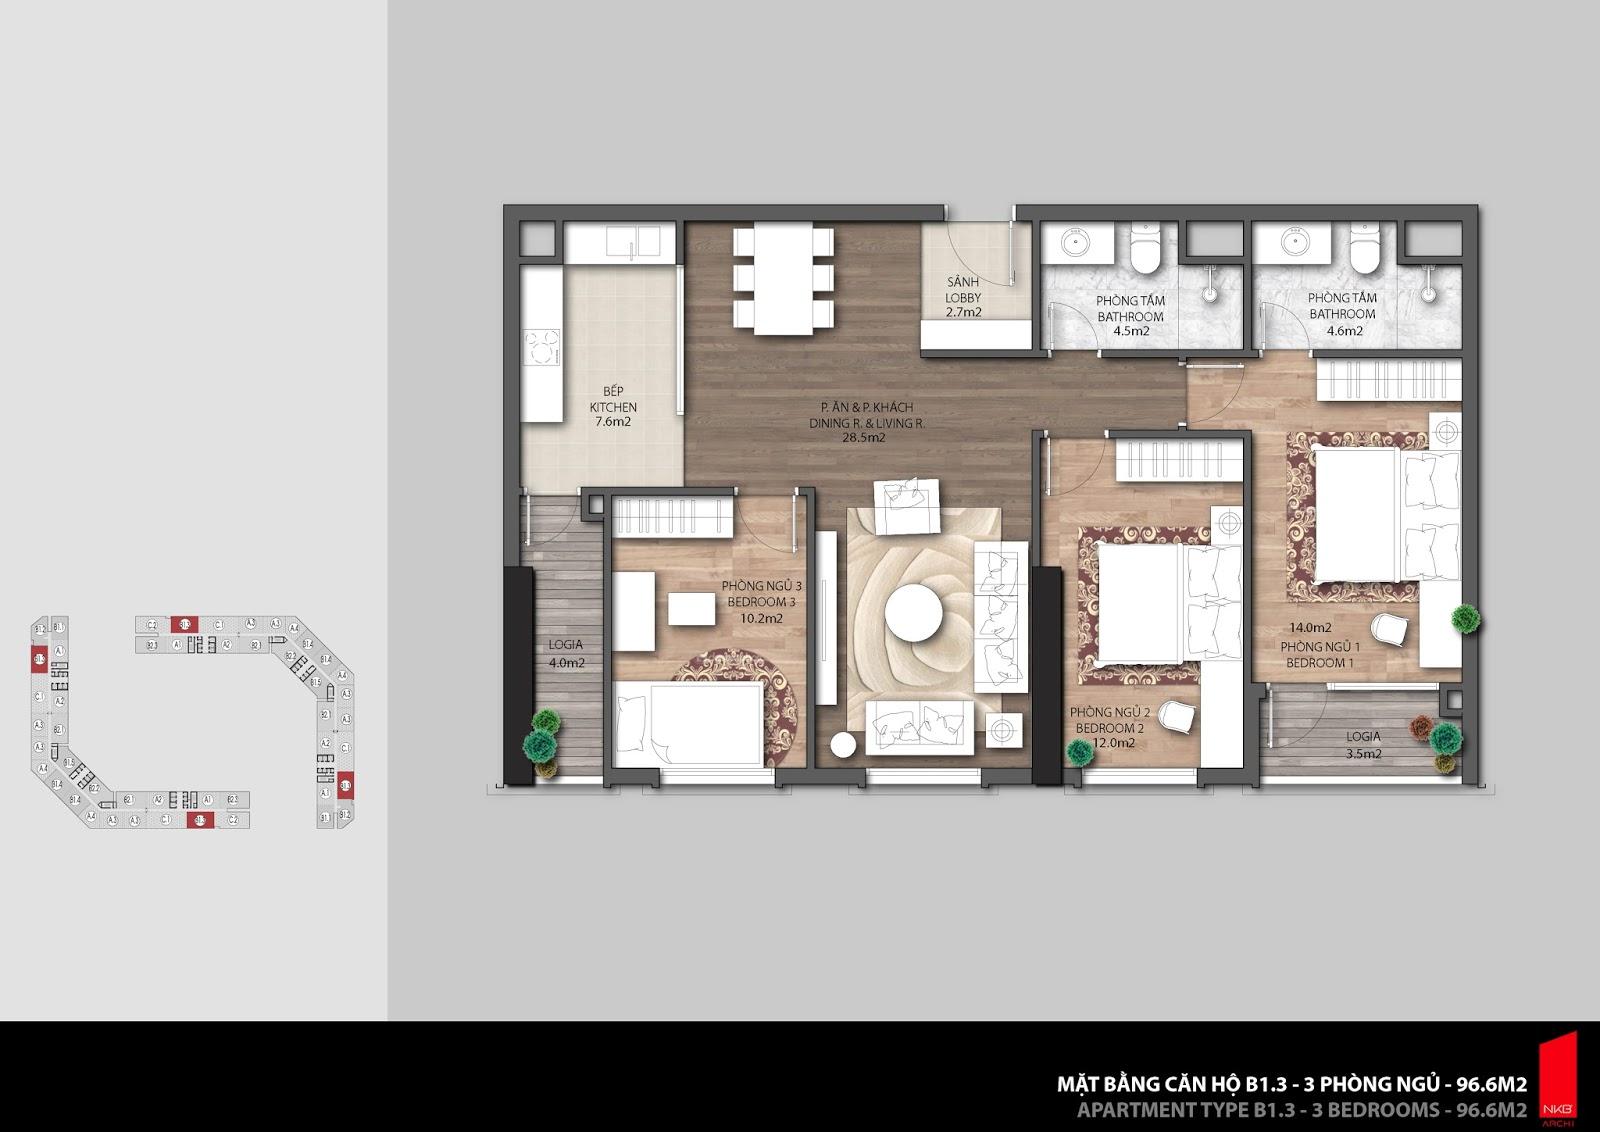 Mặt bằng căn hộ 96,6m2